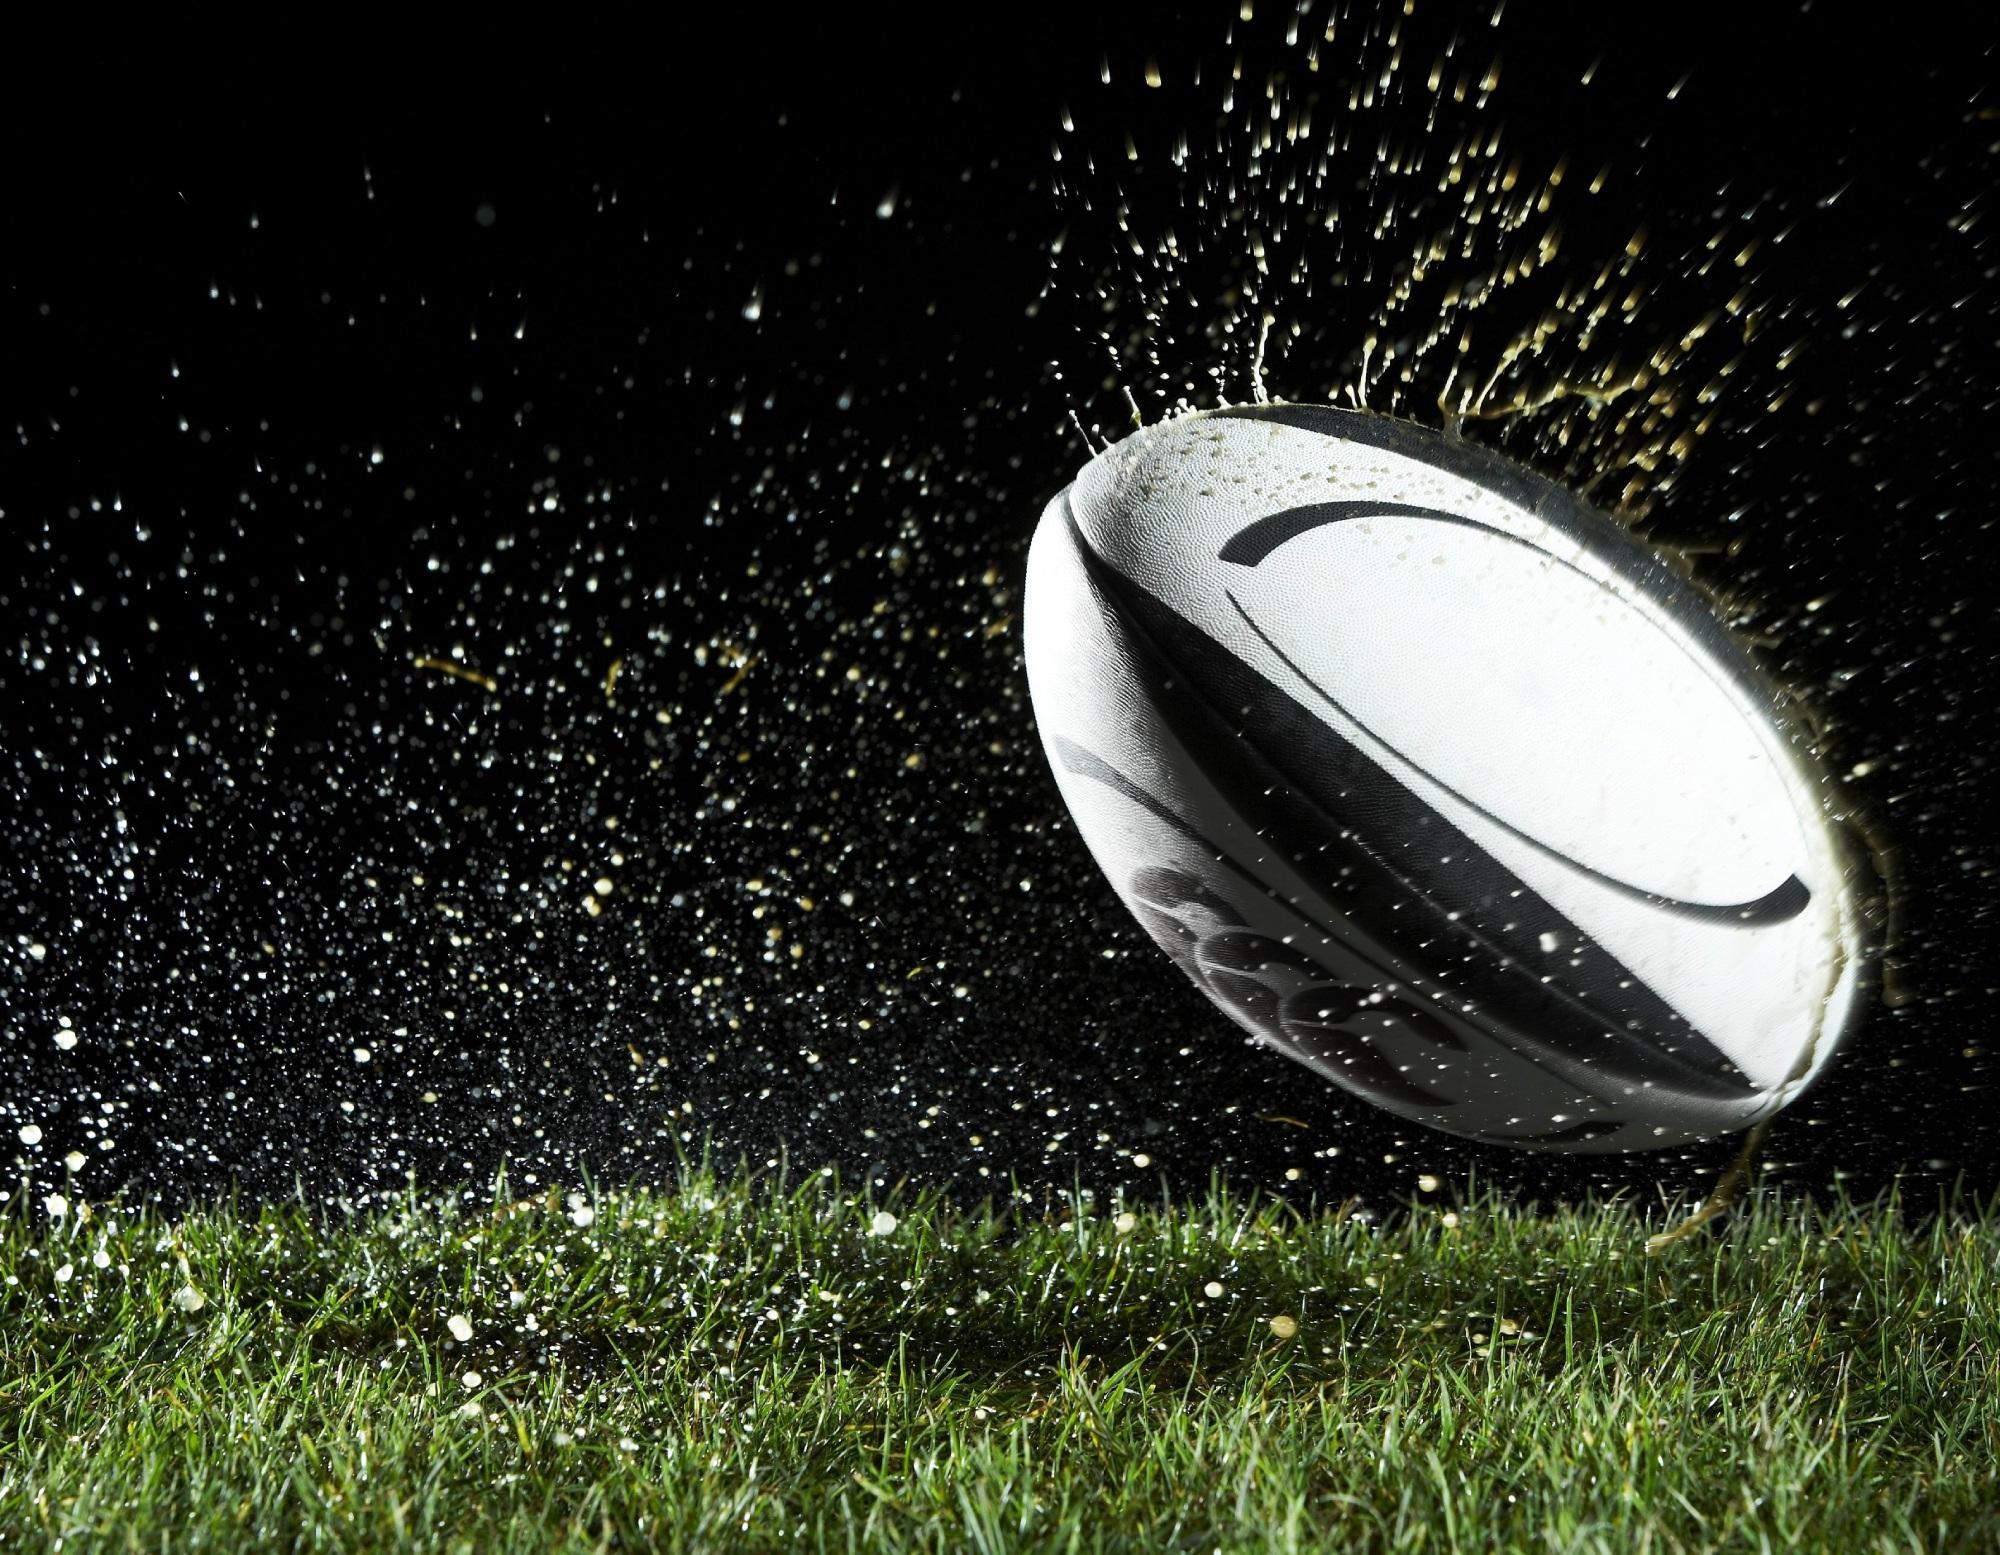 Rugby Union: Mandurah Pirates go down in derby clash to Rockingham